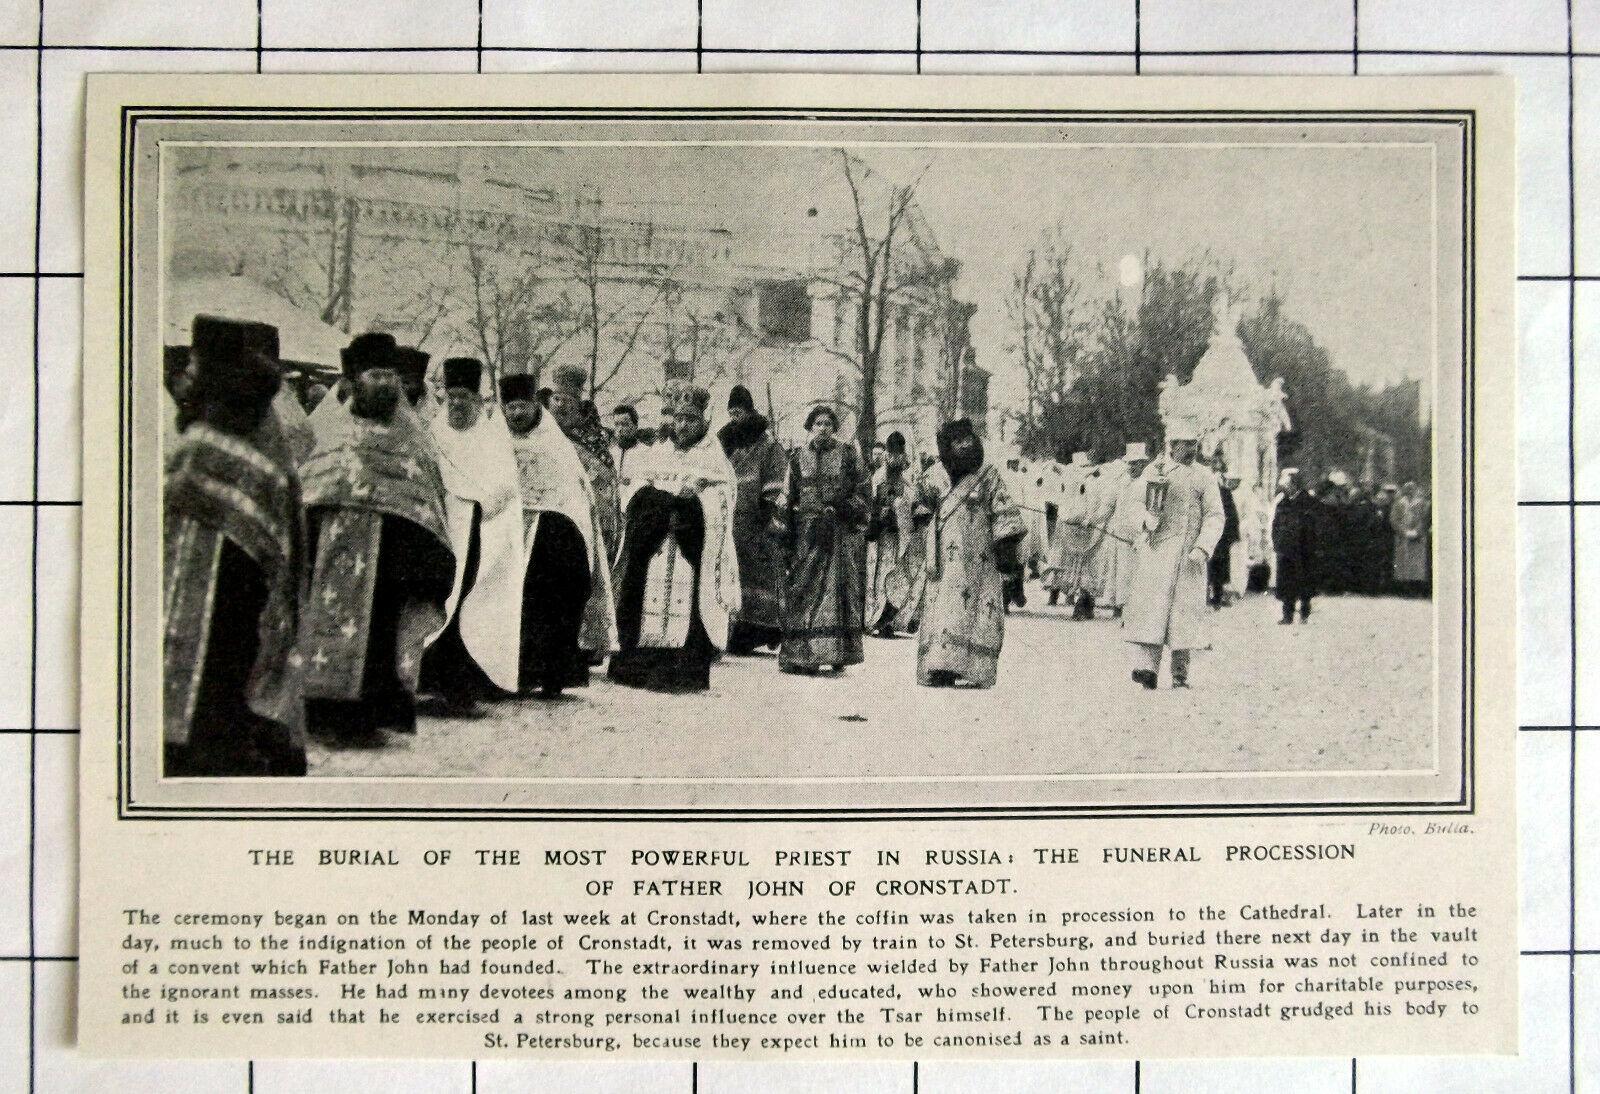 Фото - https://picclick.com/1909-Funeral-Procession-Of-Father-John-Of-Cronstadt-323863521683.html#&gid=1&pid=1